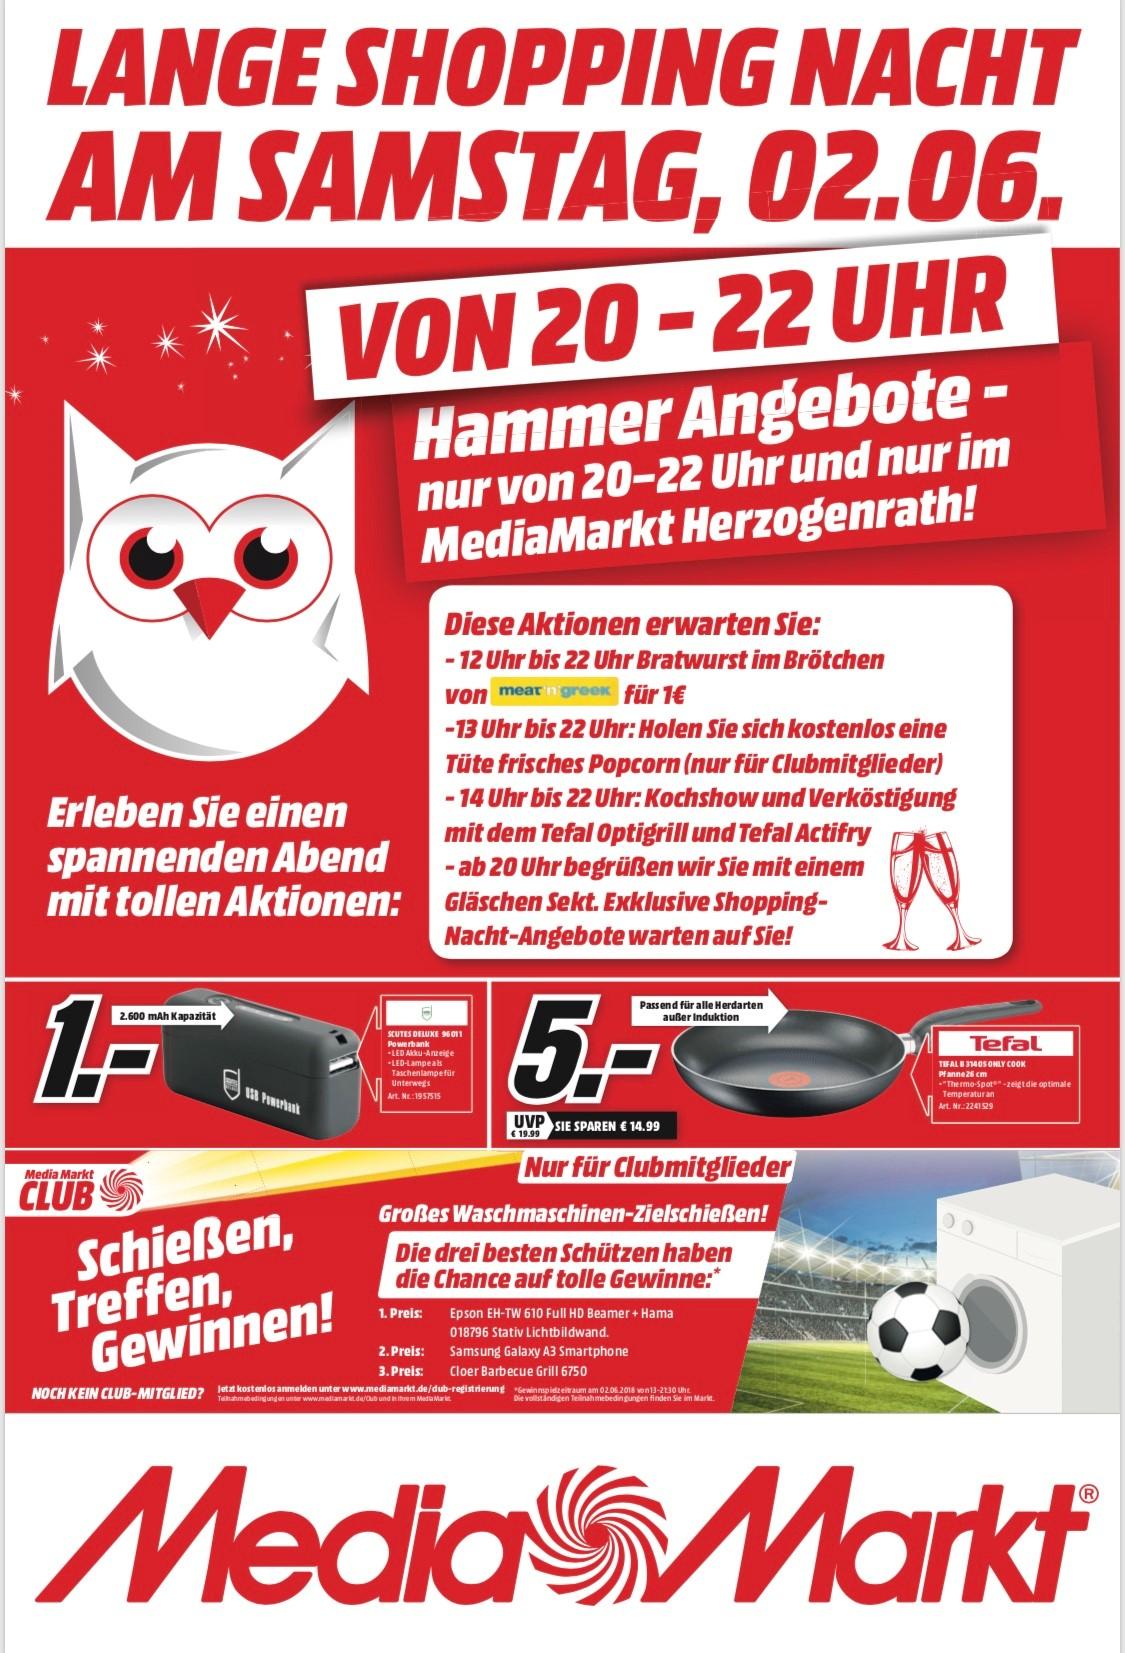 (LOKAL Media Markt Herzogenrath) Scutes Deluxe USB Powerbank 96011 mit LED Lampe 2600mAh